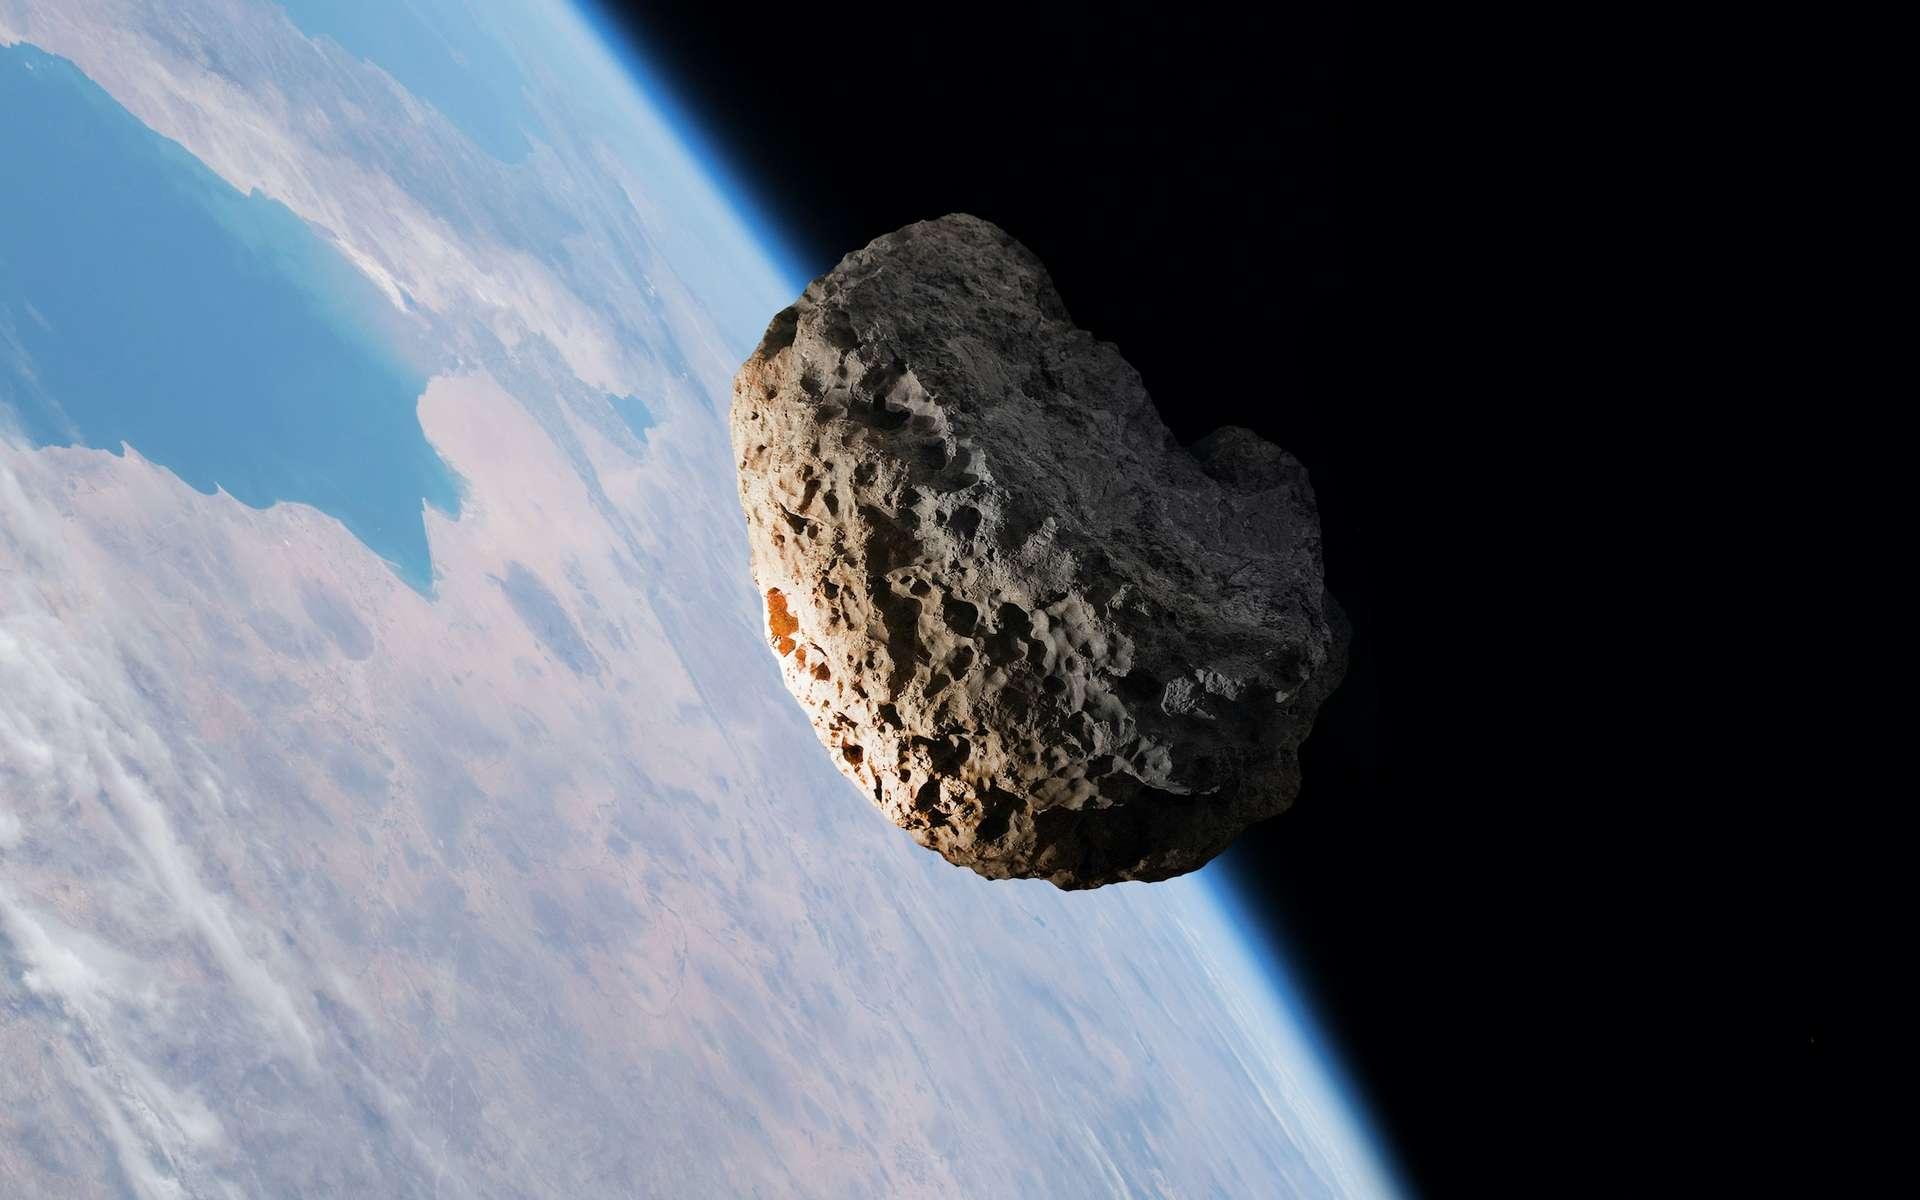 Illustration d'un astéroïde survolant la Terre. © tangoas, Adobe Stock